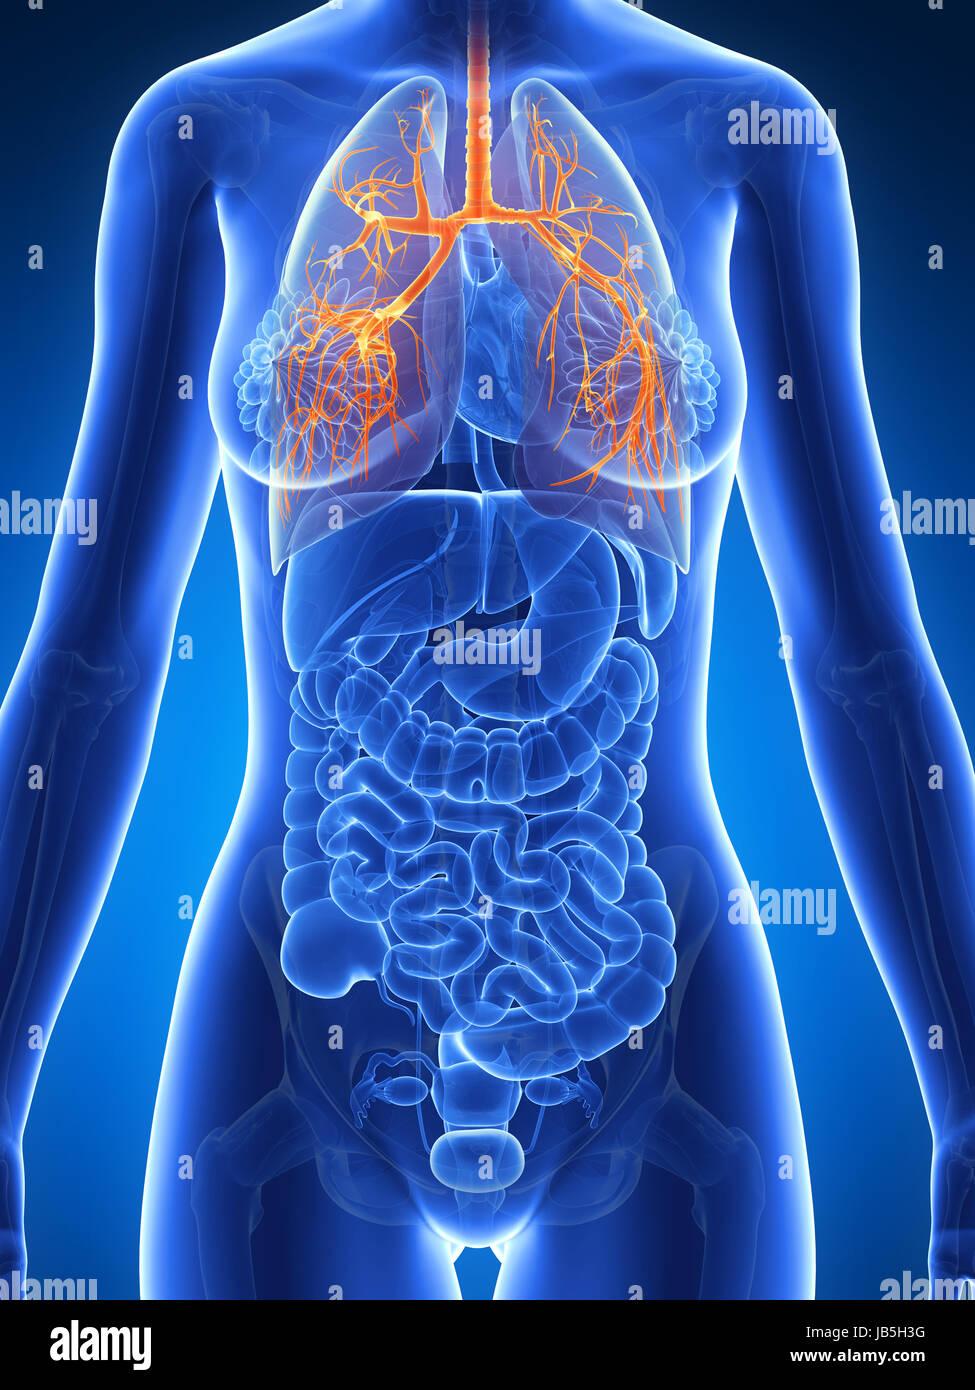 3d rendered illustration of the female anatomy - bronchi Stock Photo ...